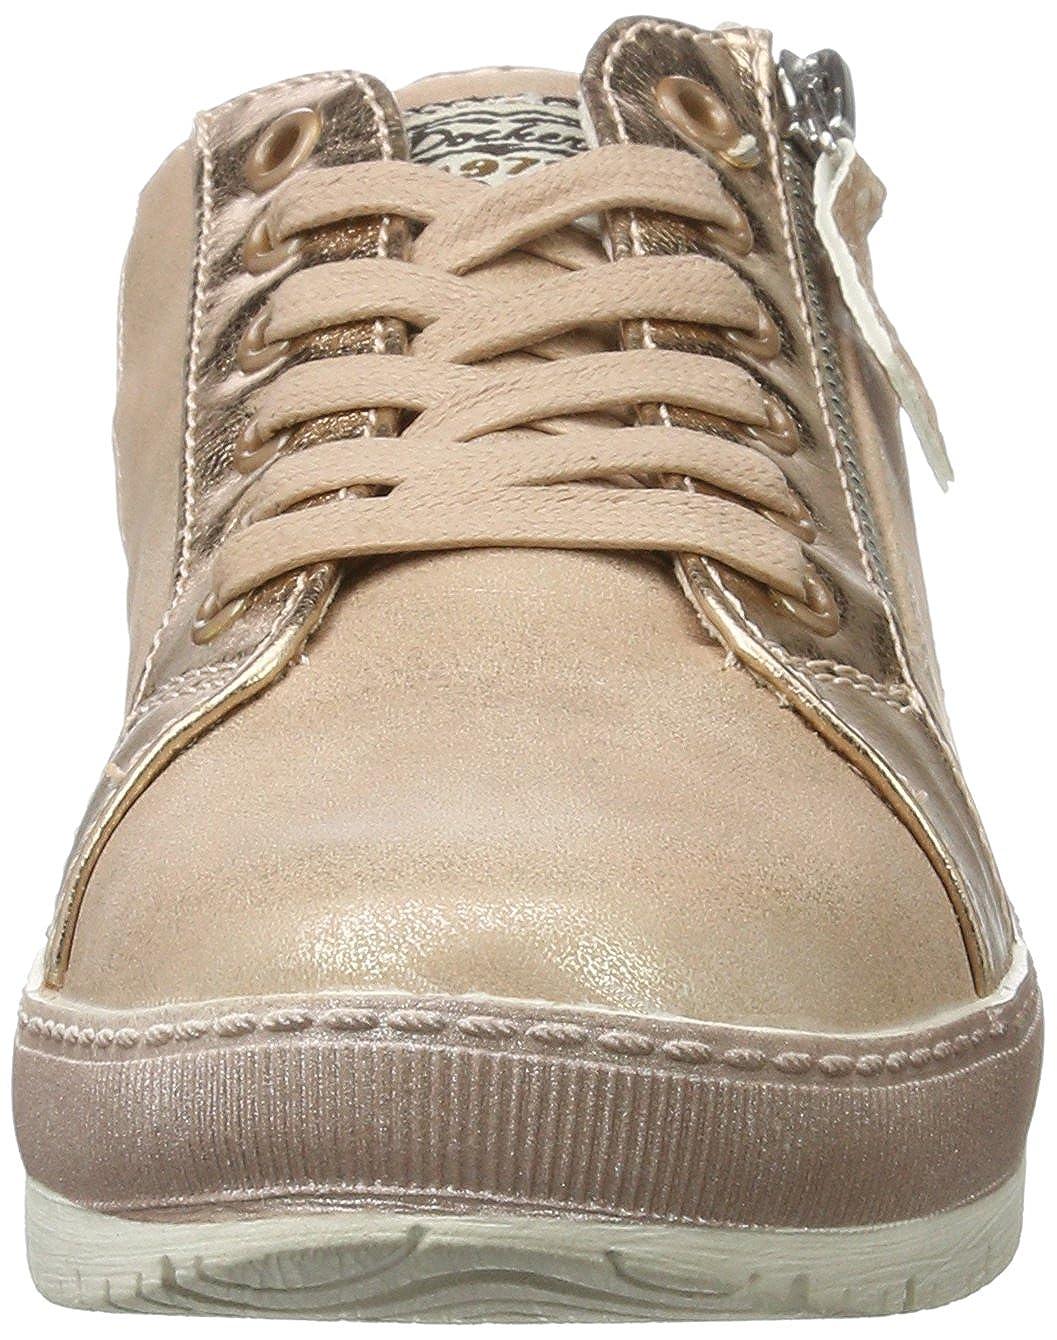 Dockers by Gerli Women/'s 35ne217-686760 Hi-Top Sneakers